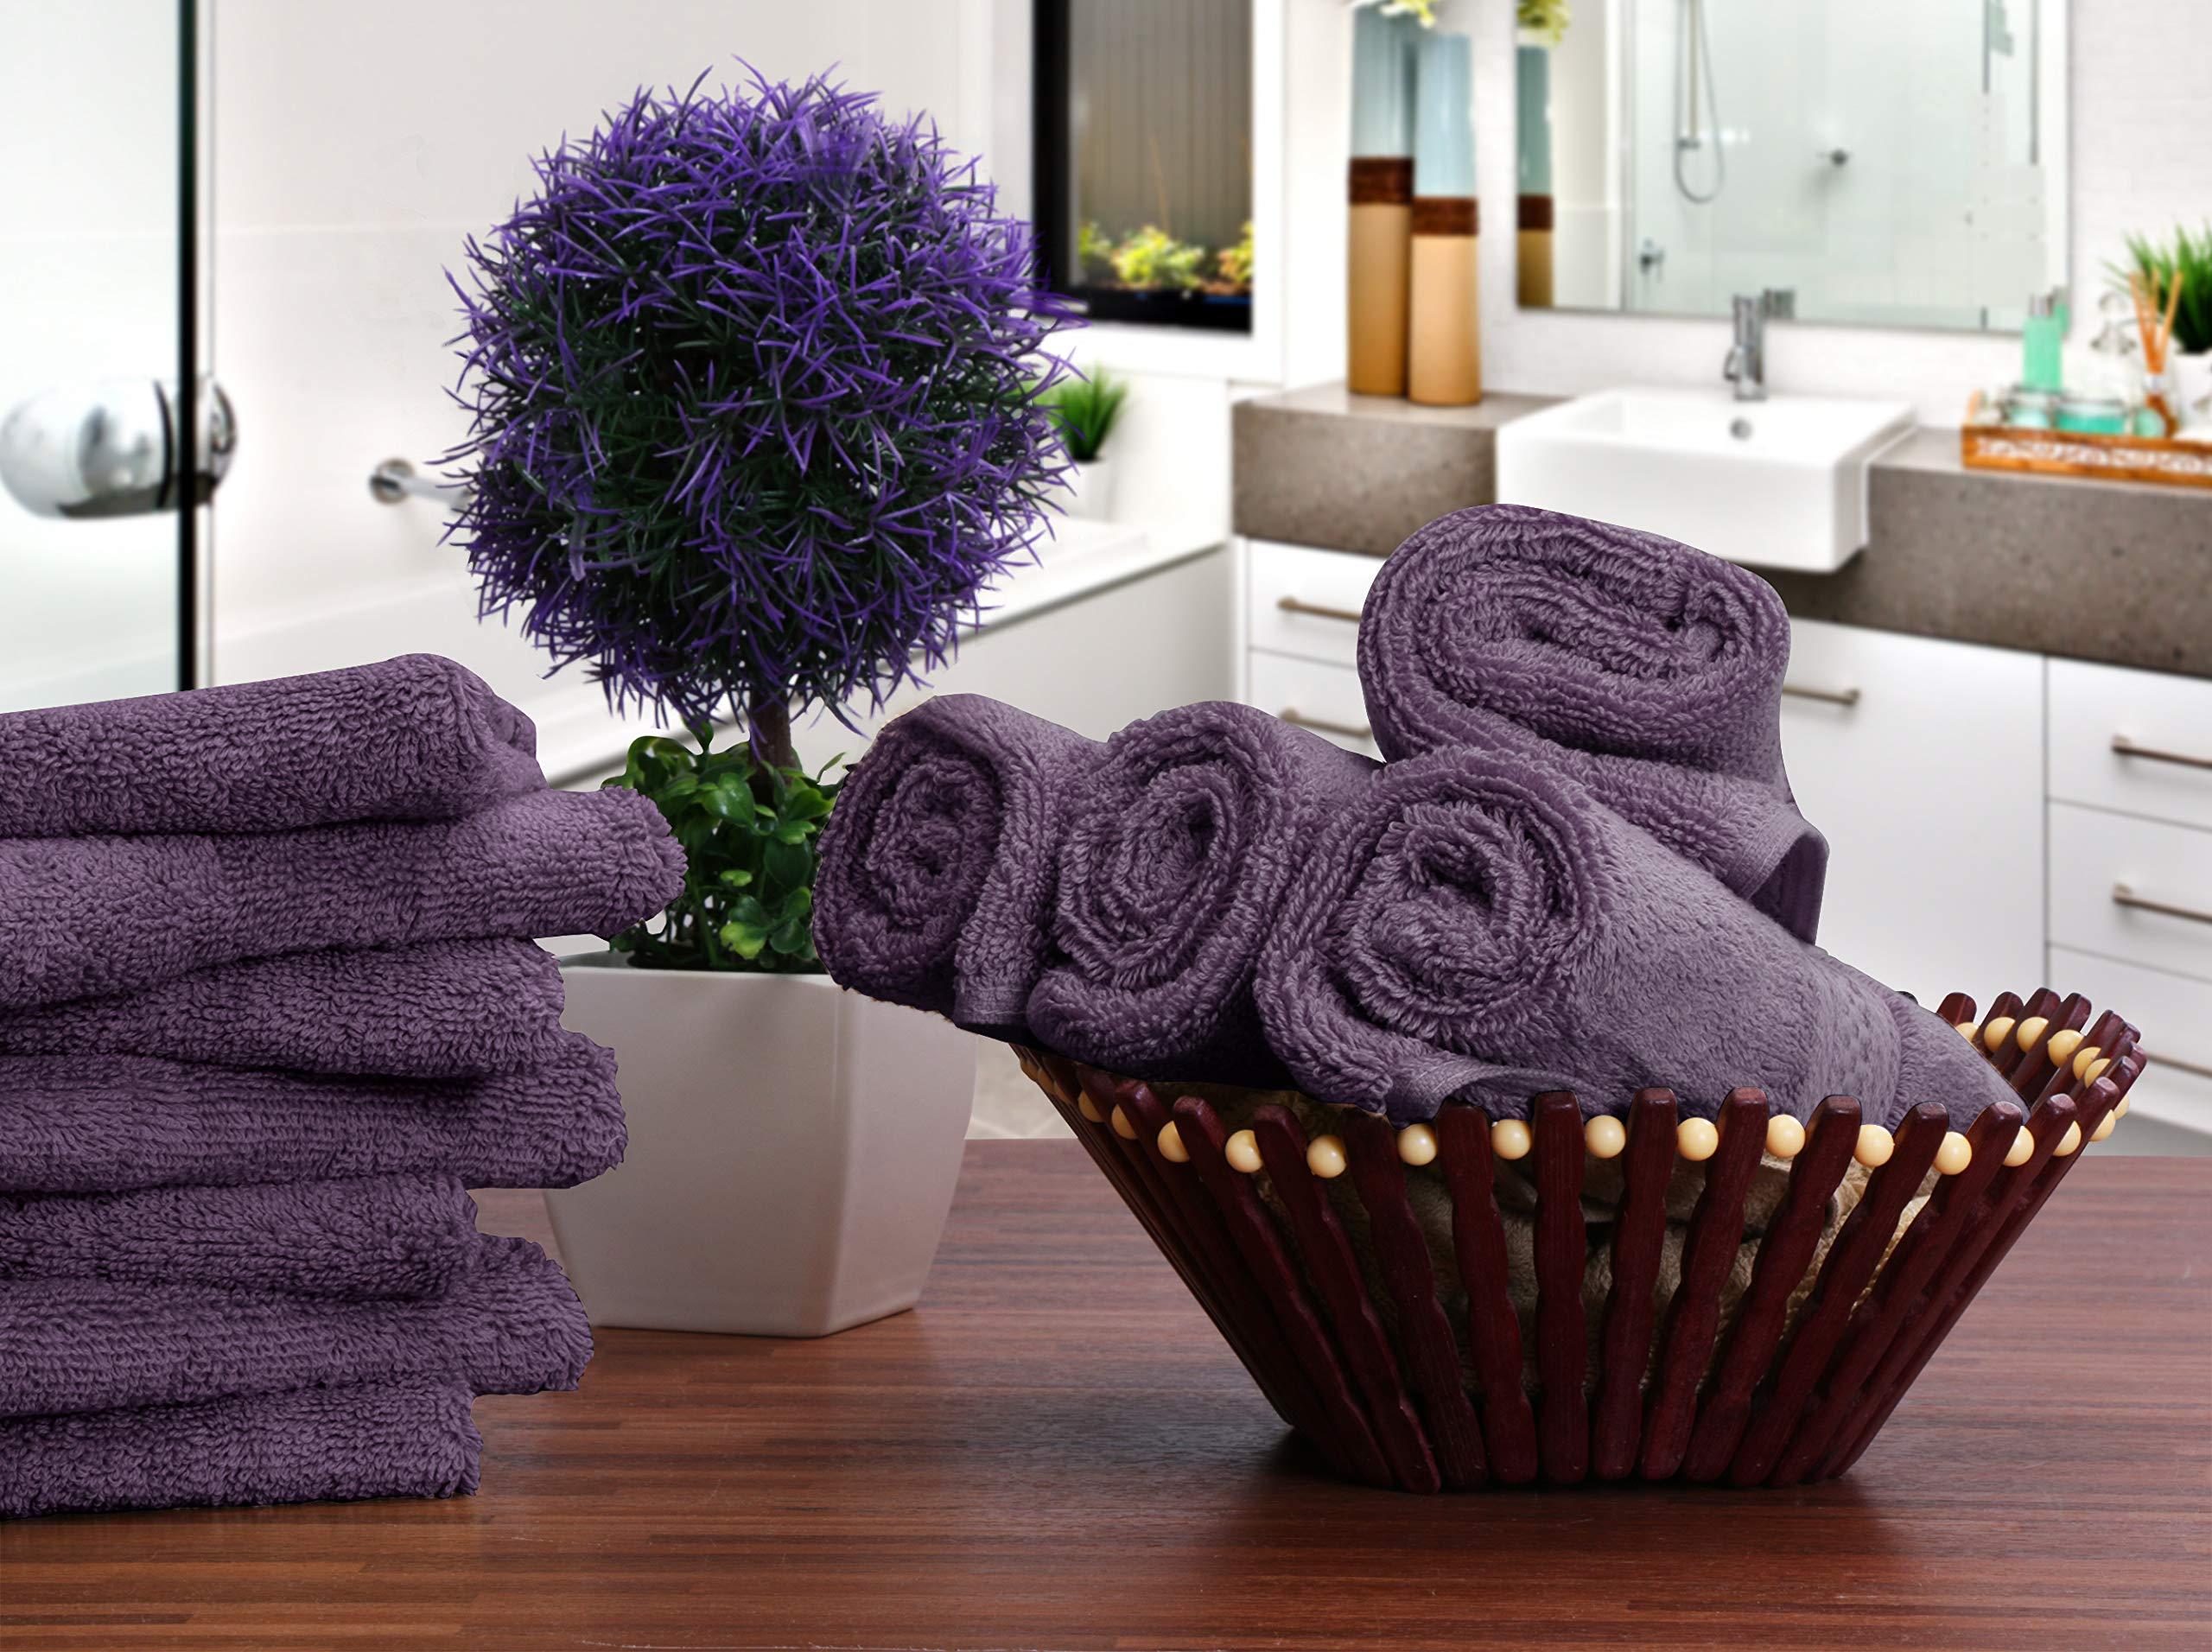 Utopia Towels Premium 252 Pack 700 GSM Cotton Washcloths Bulk– (12 x 12 Inches Face Towels Bulk) Extra Soft Wash Cloths, Plum by Utopia Towels (Image #5)